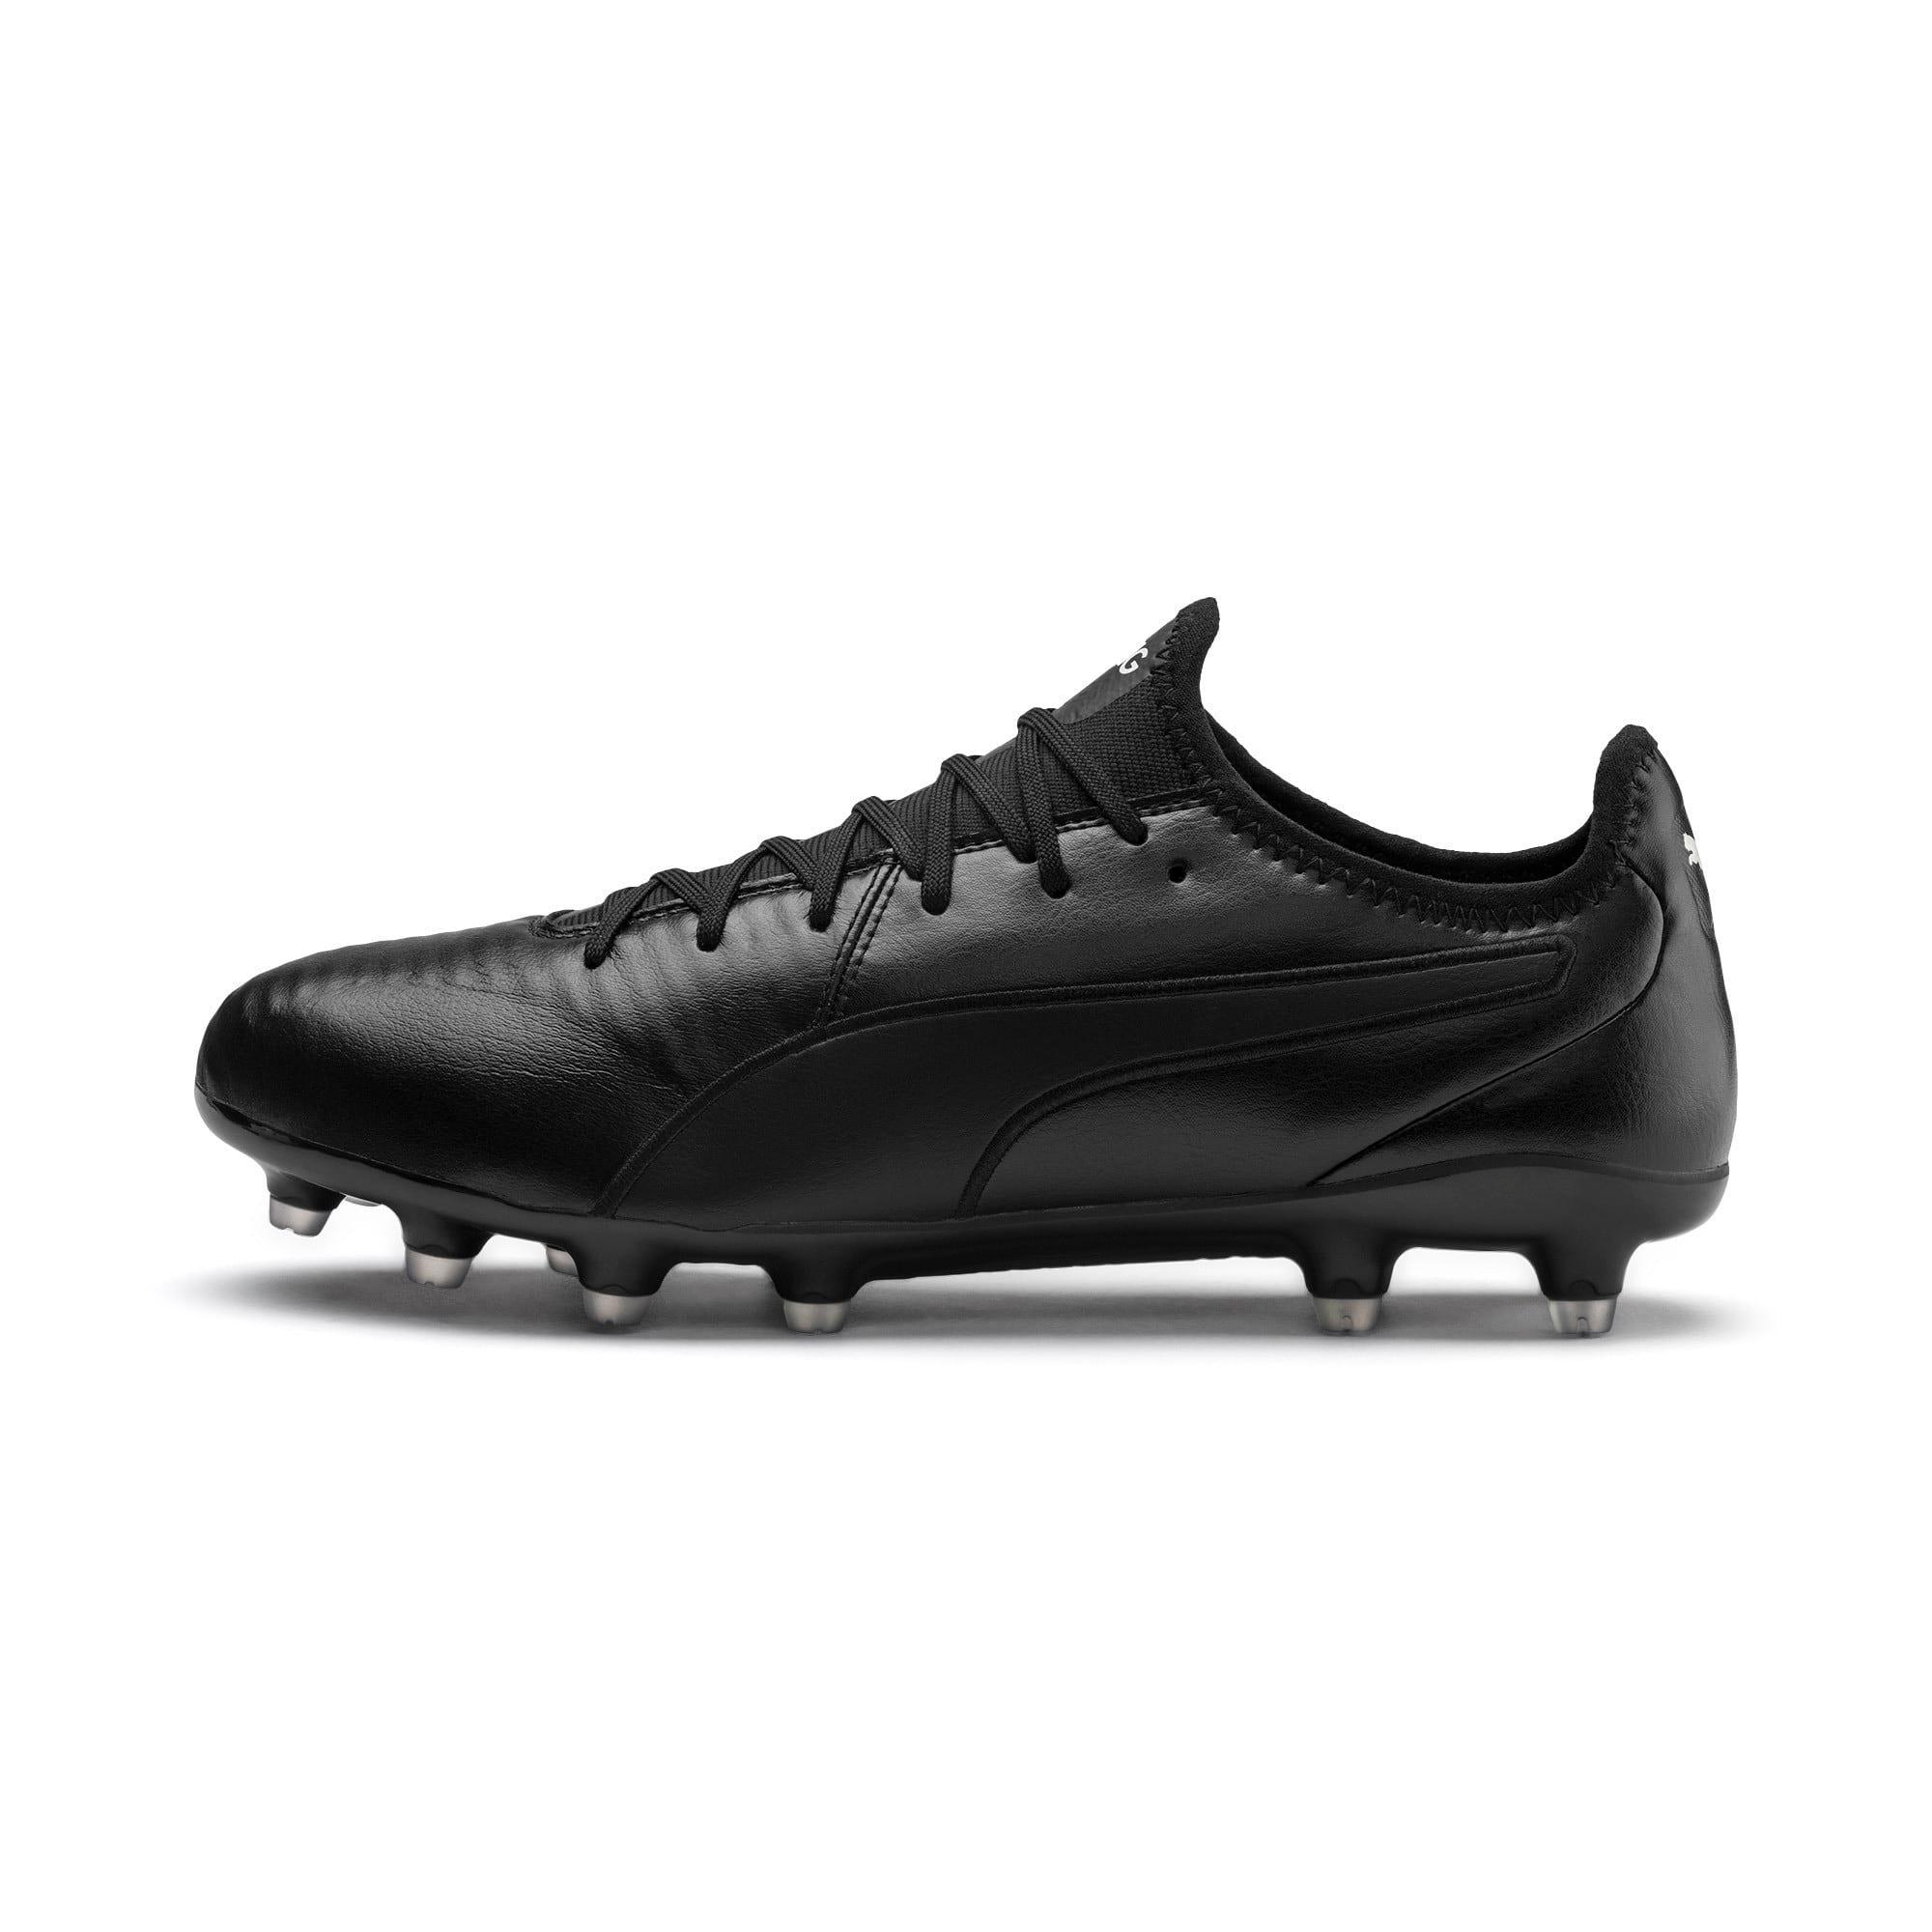 Thumbnail 1 of King Pro FG Soccer Cleats, Puma Black-Puma White, medium